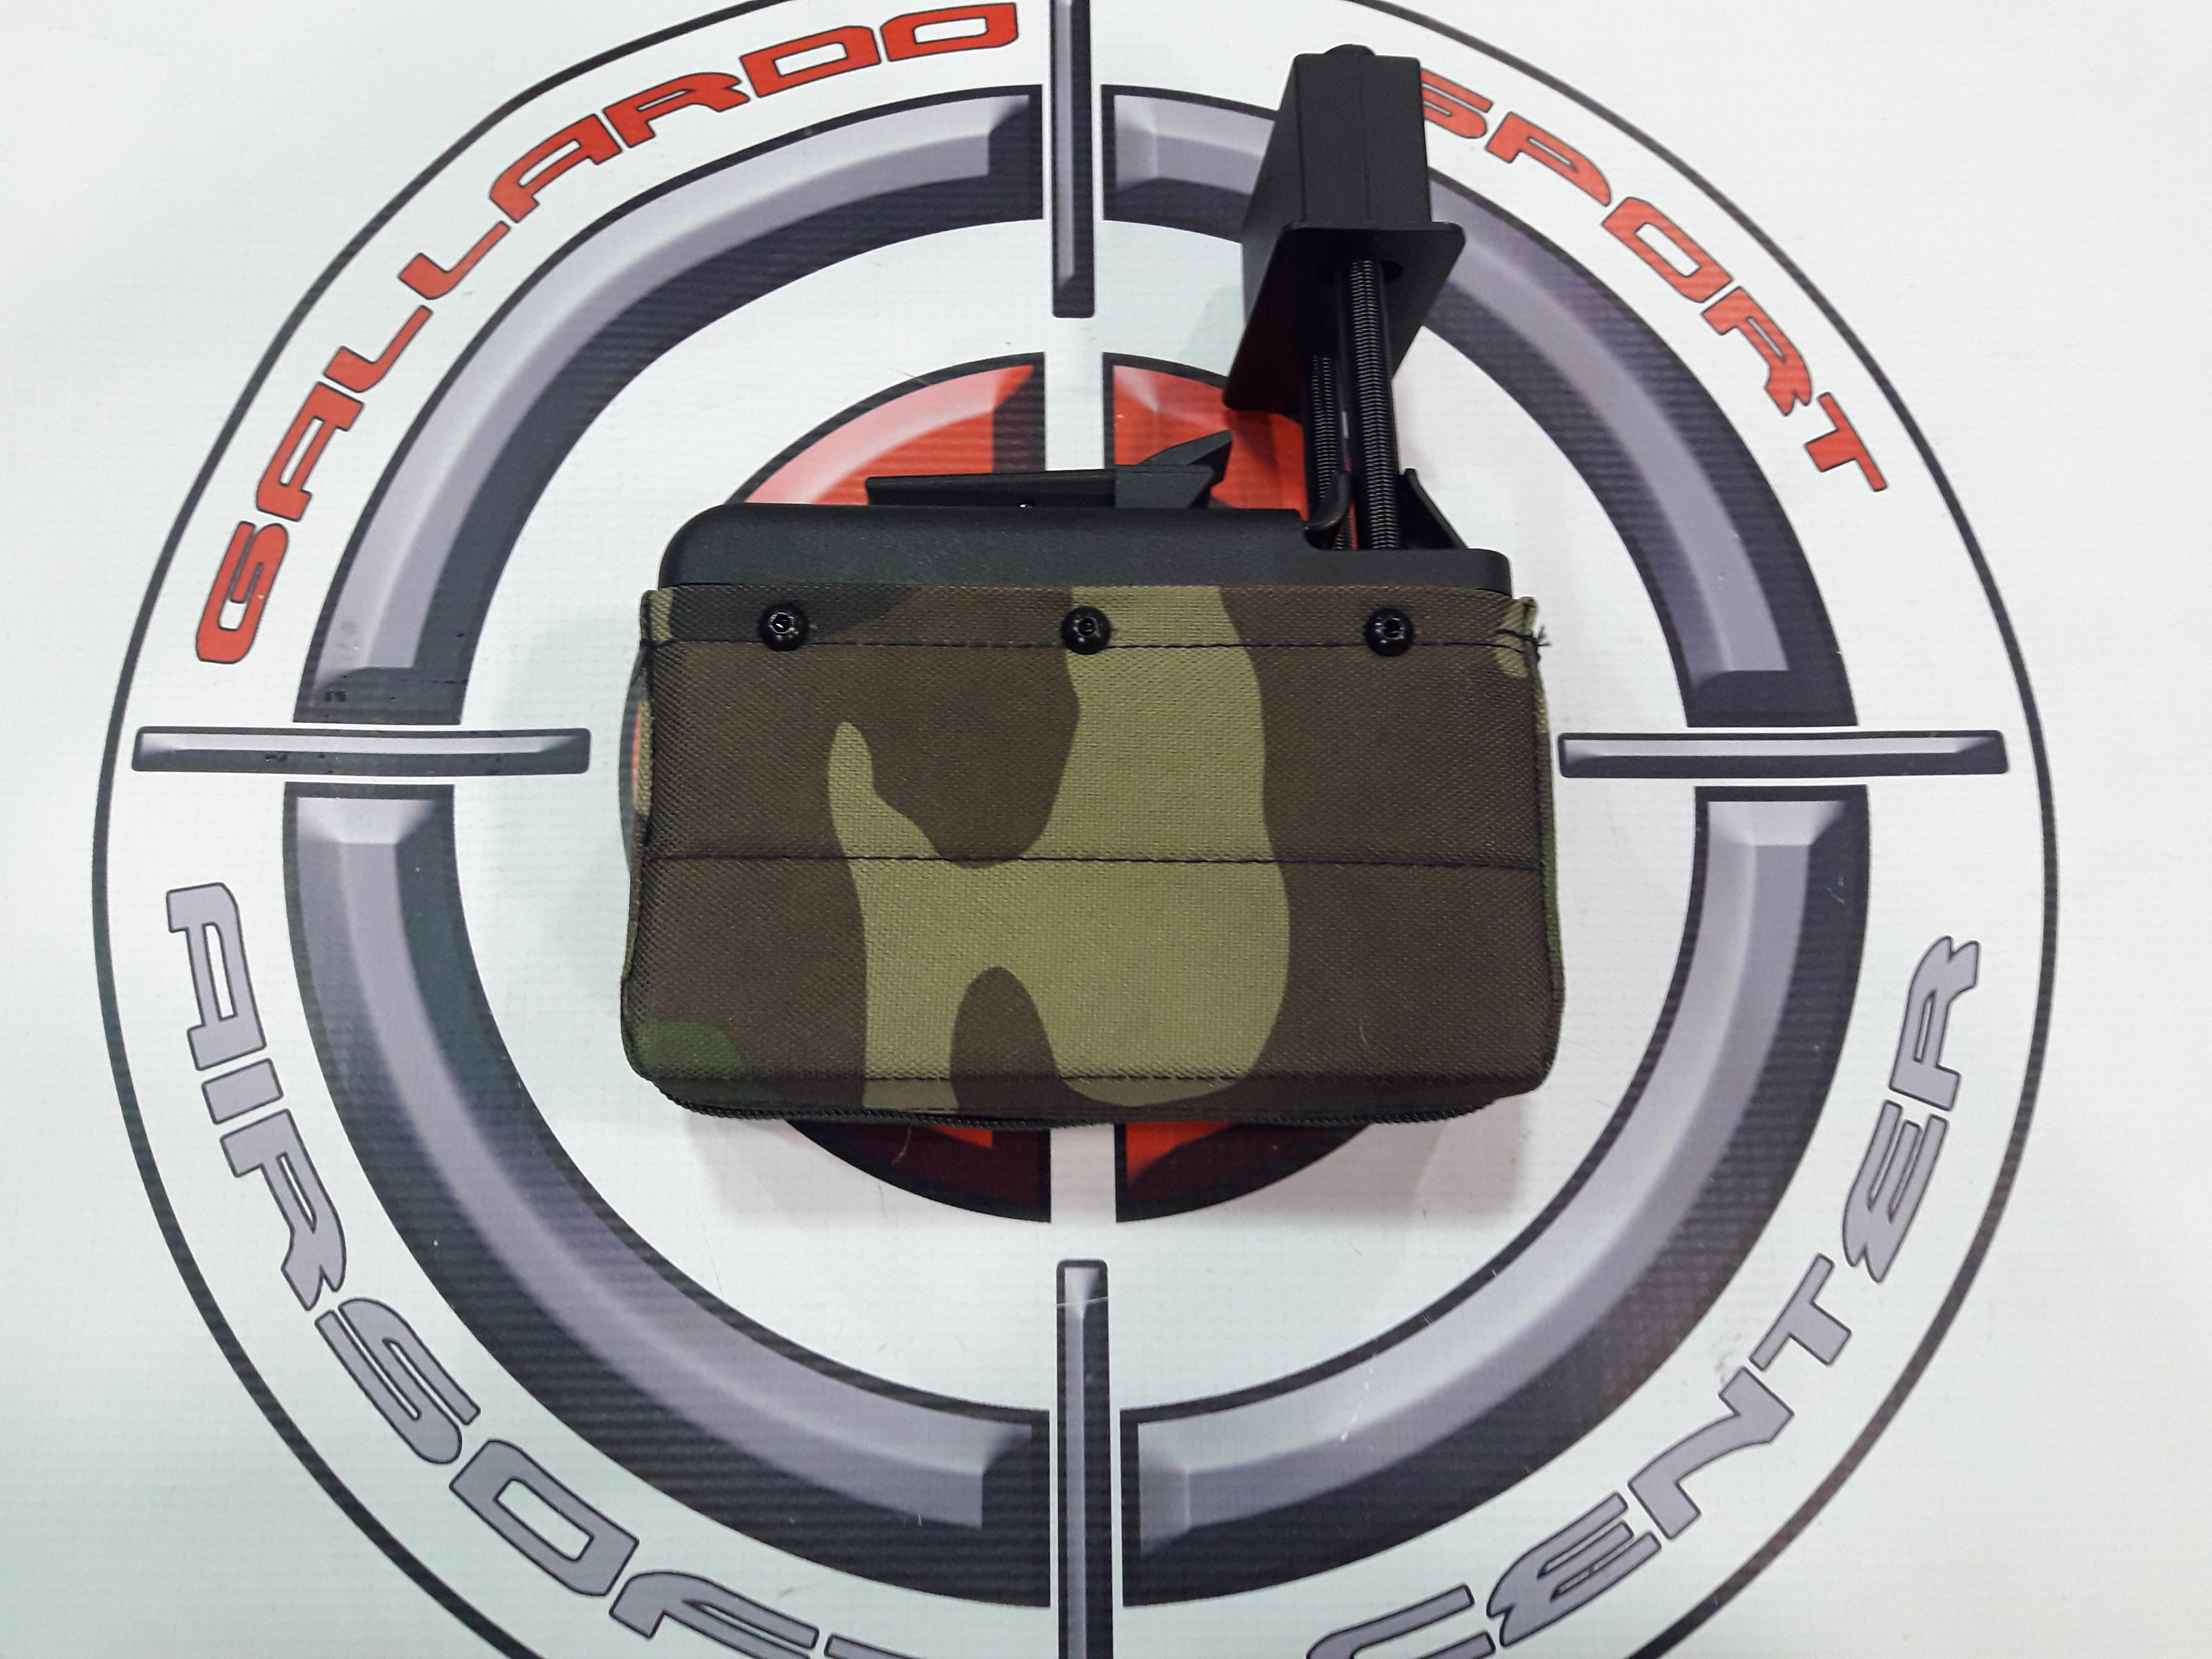 CARGADOR DRUM M249 MINI A&K 1500 RDS WOODLAND